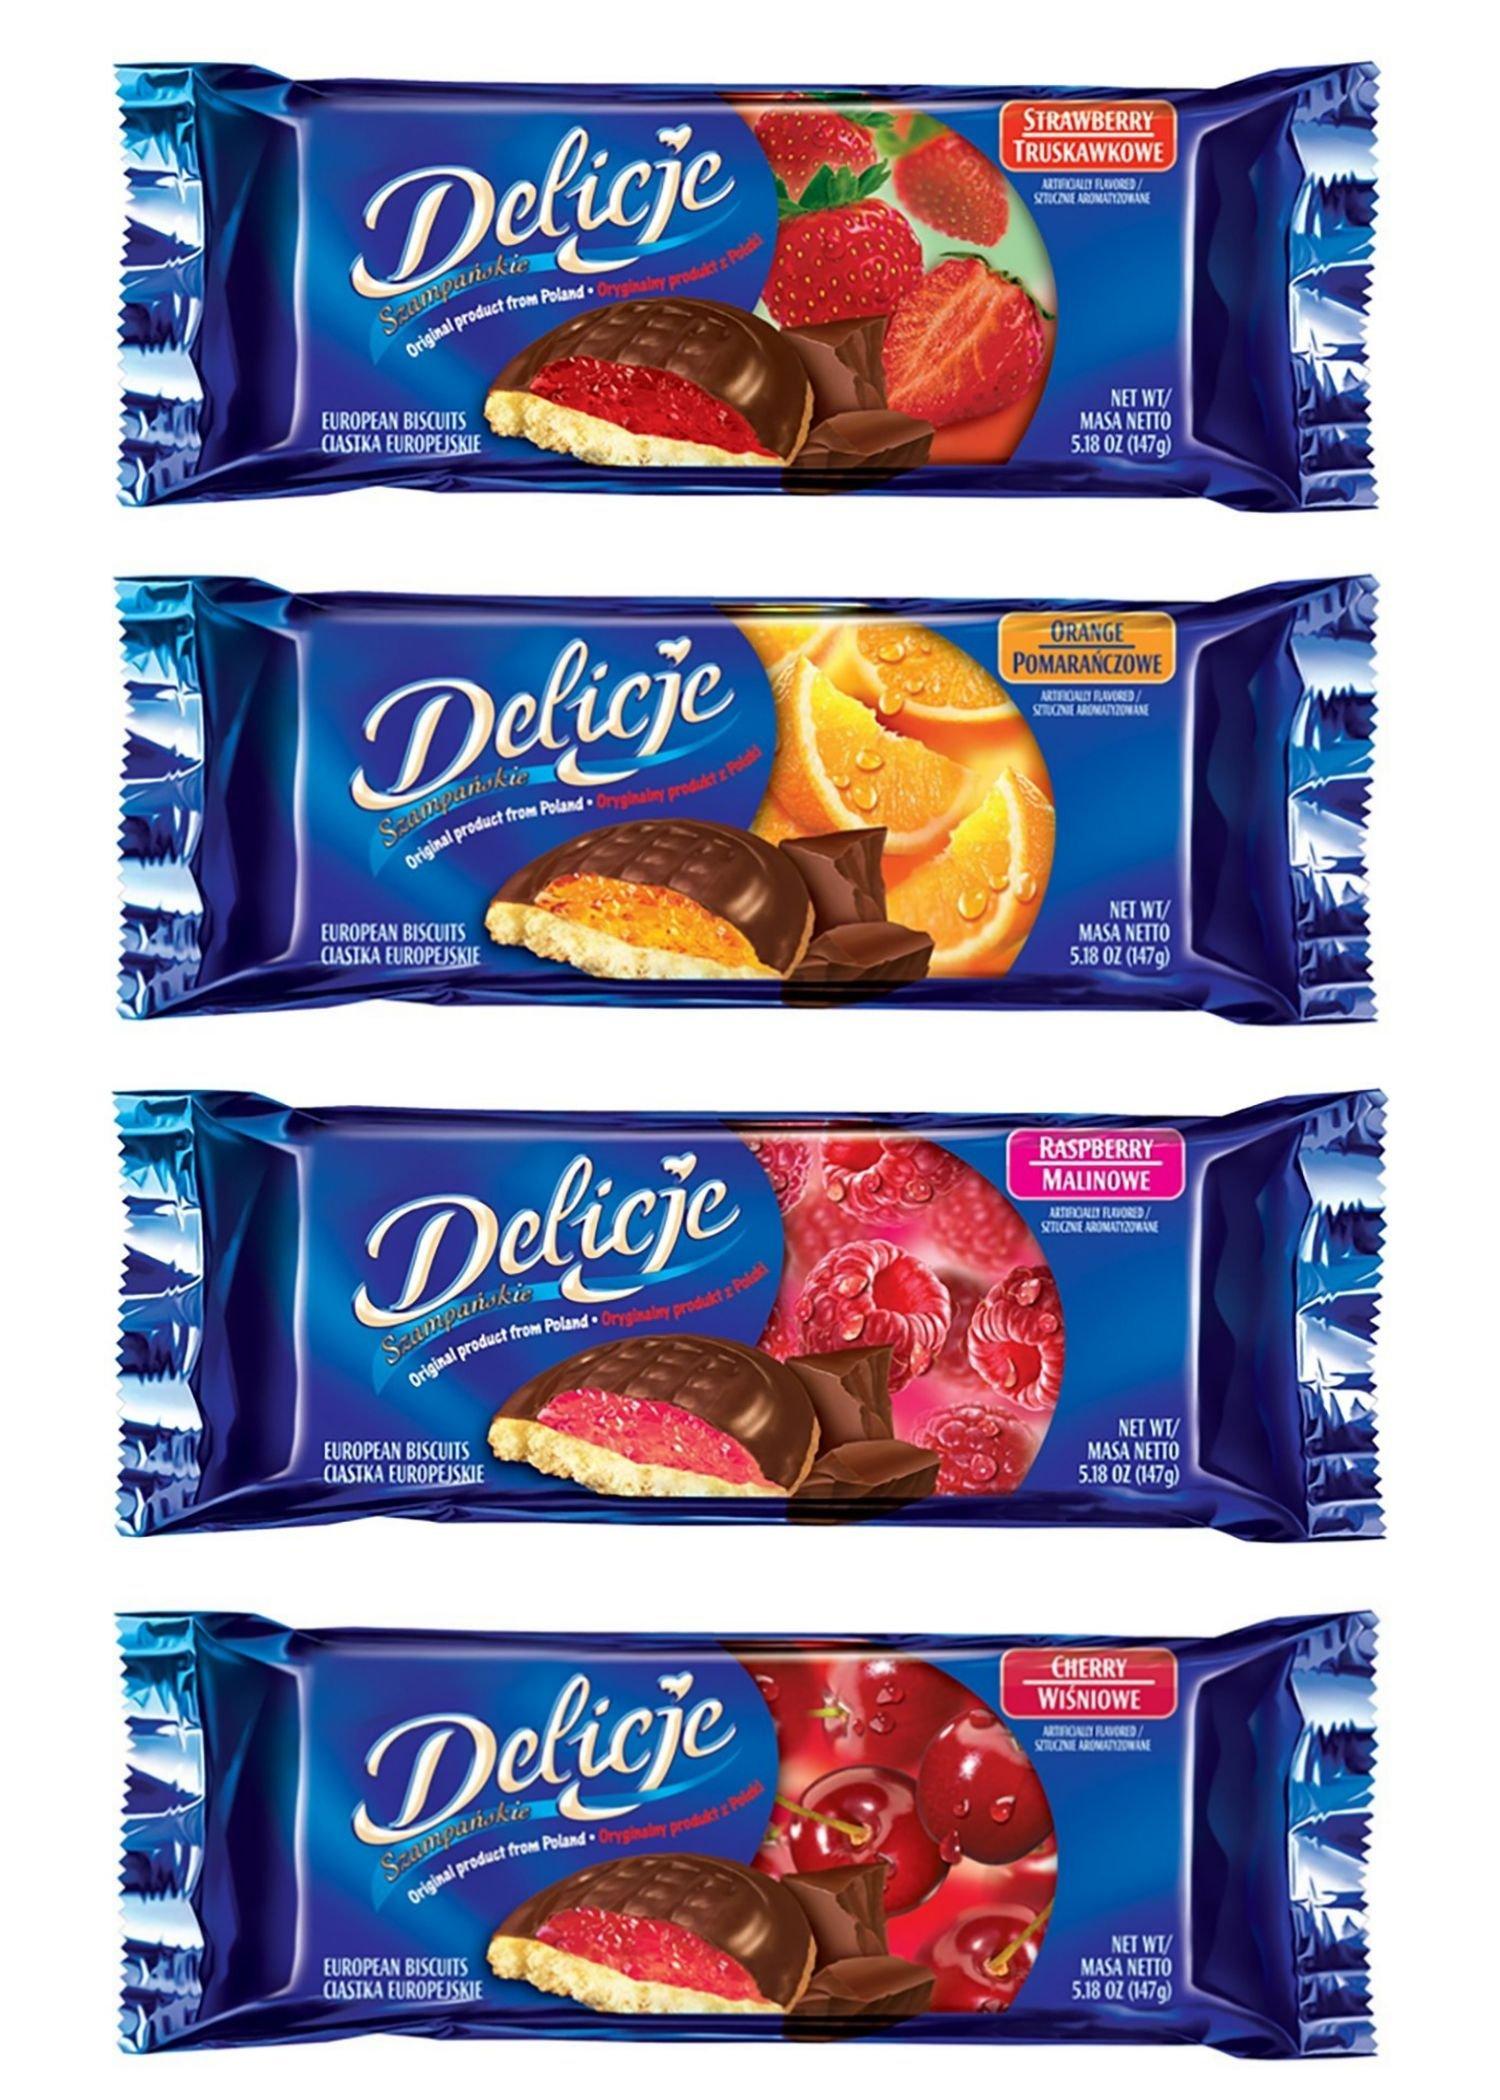 Delicje Variety Pack European Biscuits Strawberry, Orange, Raspberry, Cherry Filling